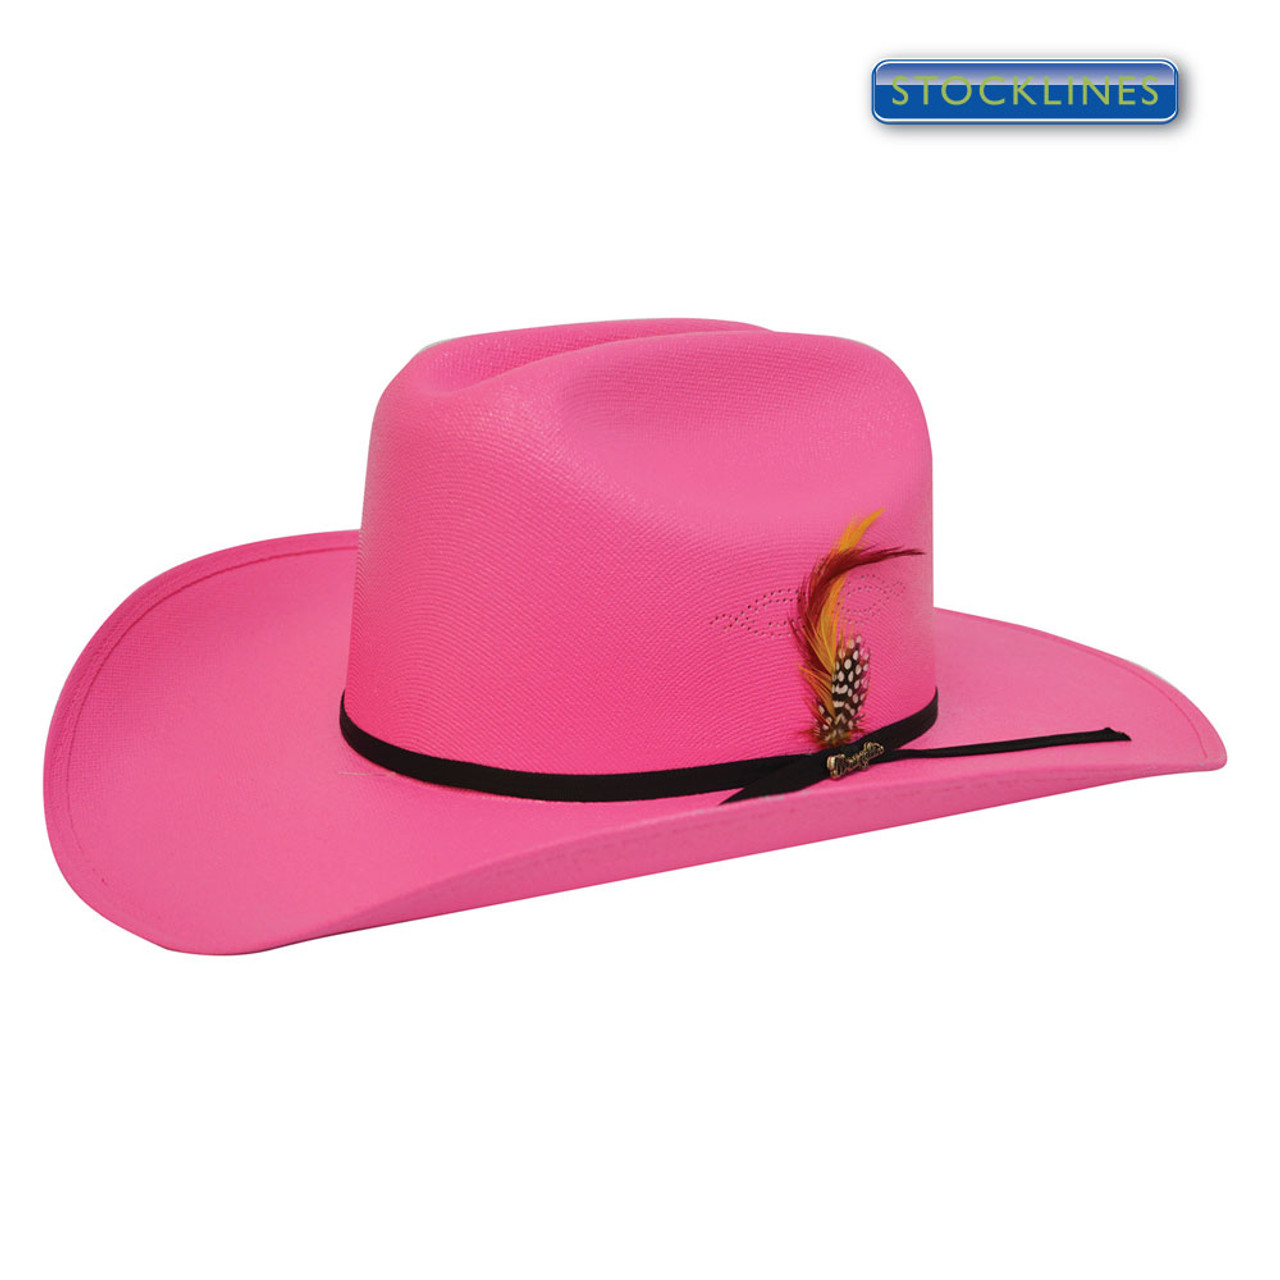 540159757f9 Wrangler Western Kids Dallas Cotton Canvas Western Hat in Fuschia  (XCP3905HAT Fuschia)